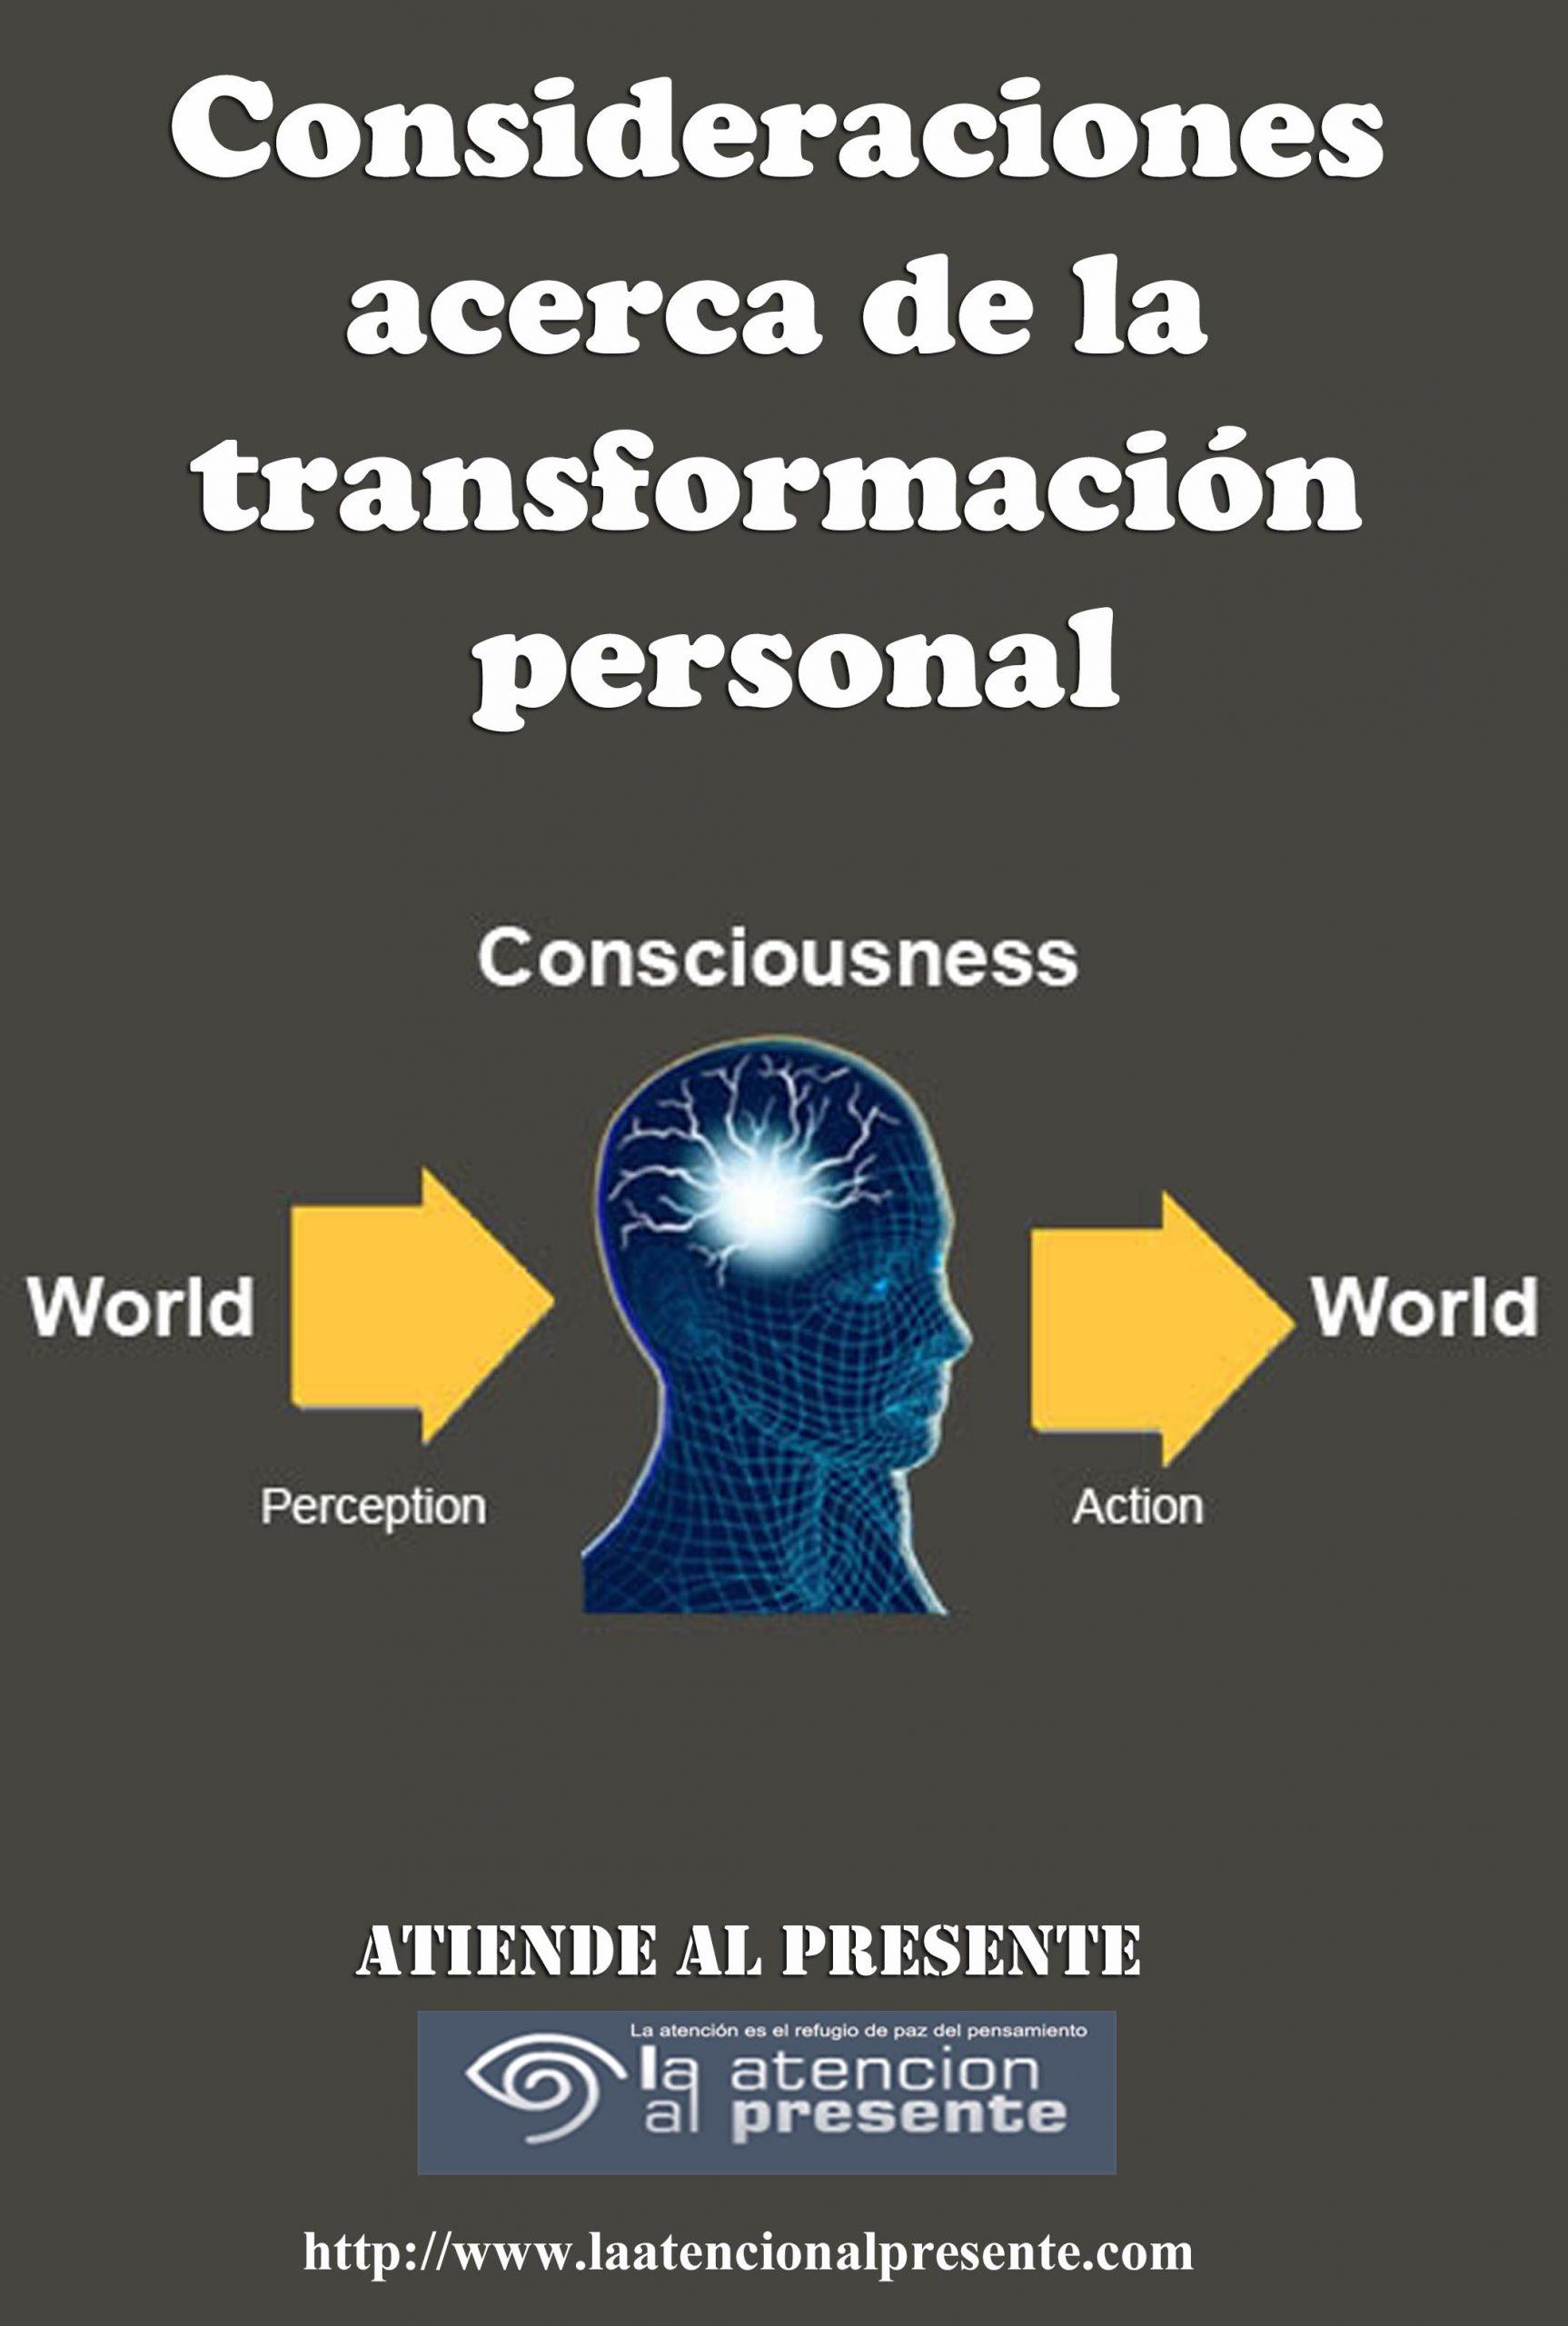 20 de Diciembre E Consideraciones acerca de la transformacion personal min scaled